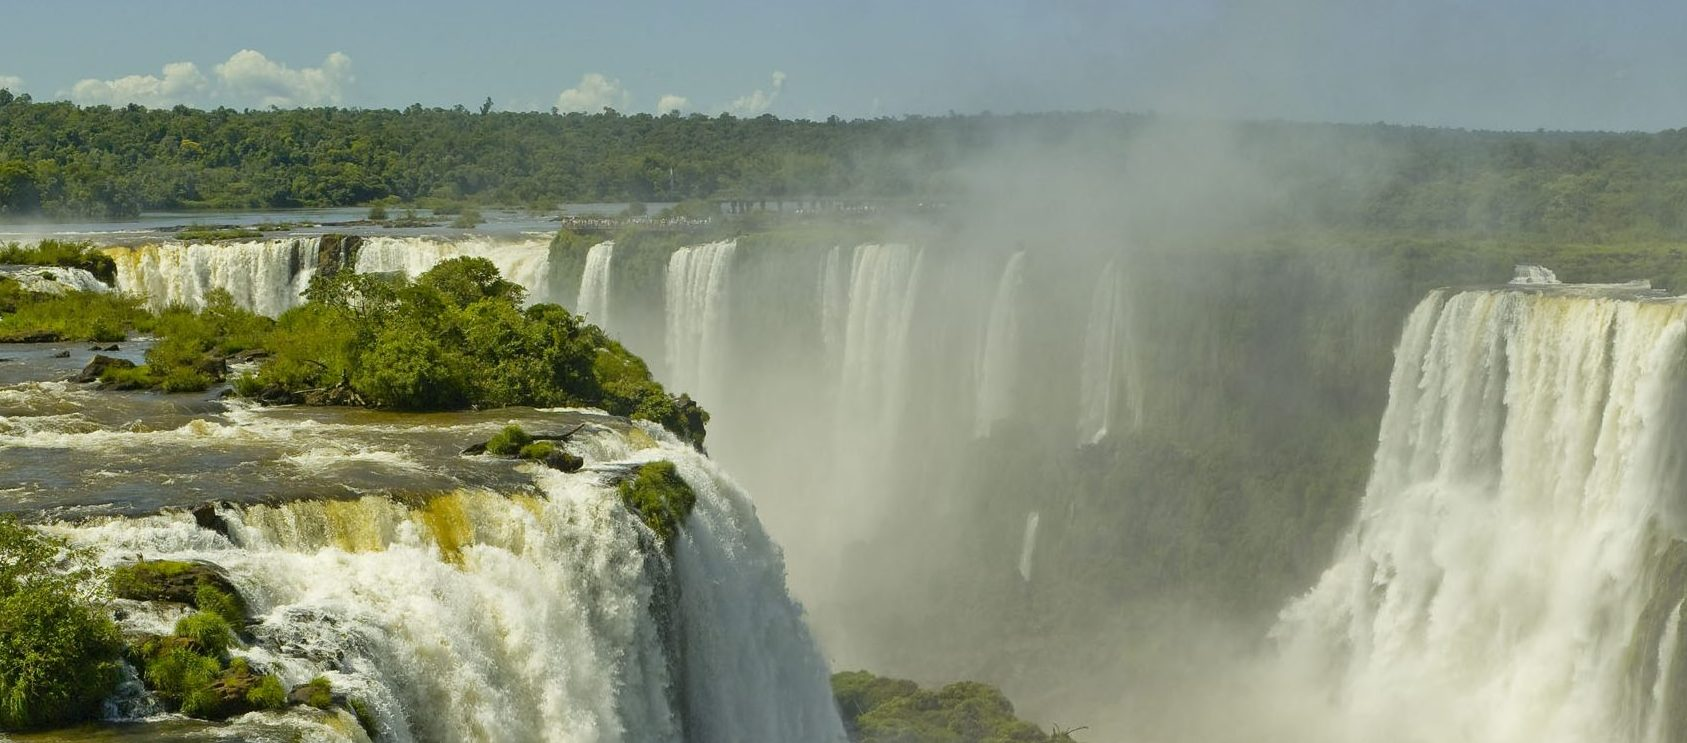 Iguaçu falls from above.